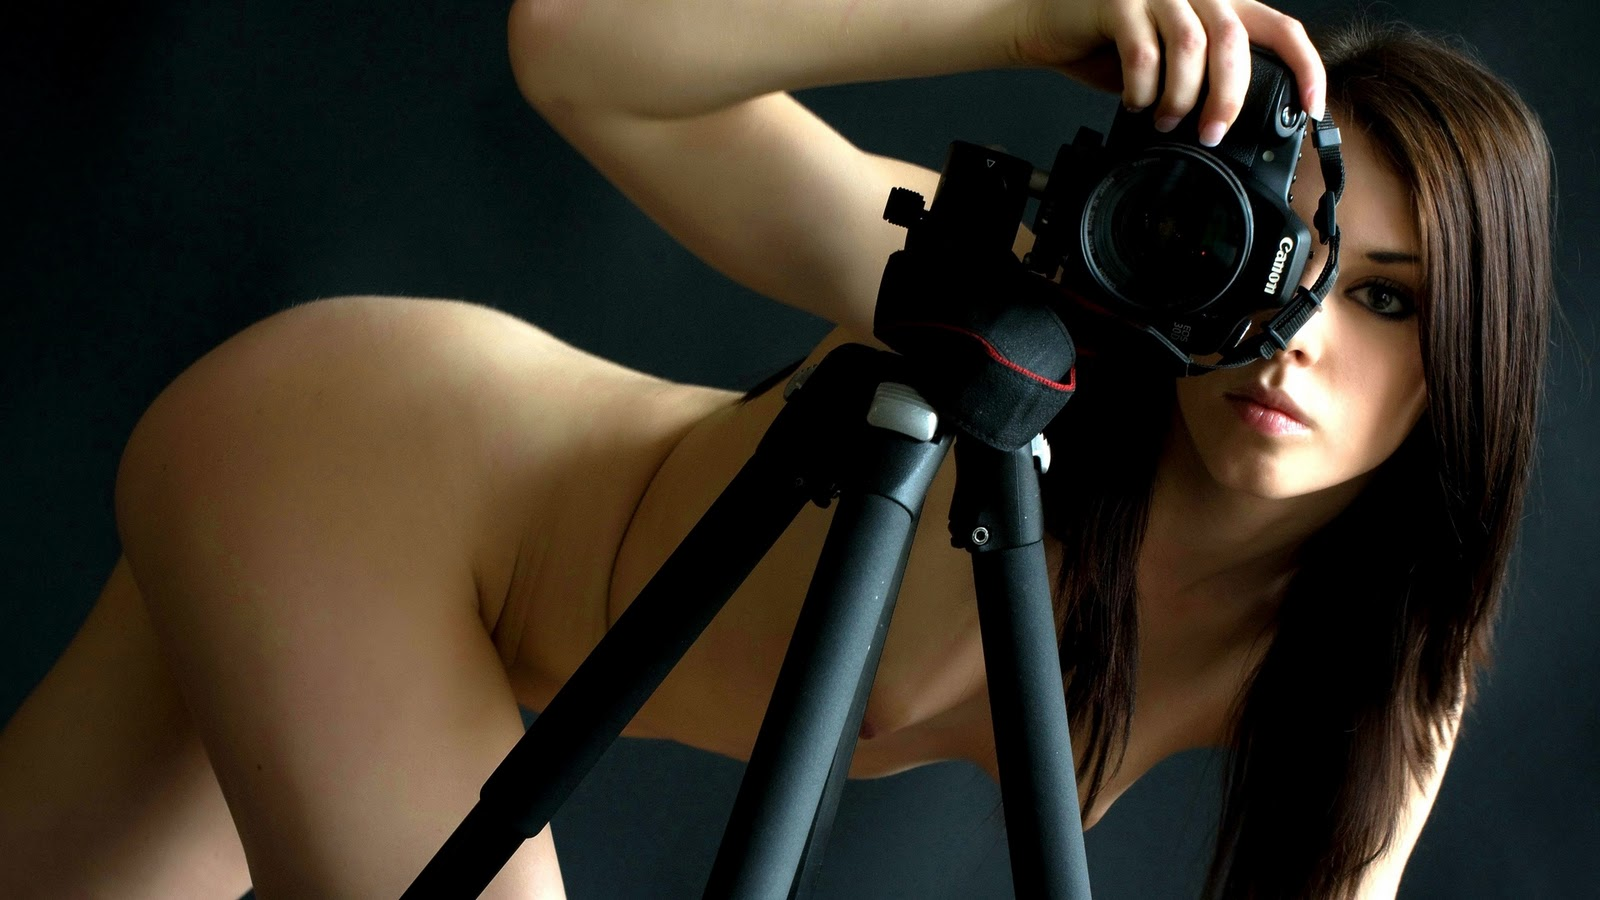 Nikki sims nude tits videos nsfw gallery